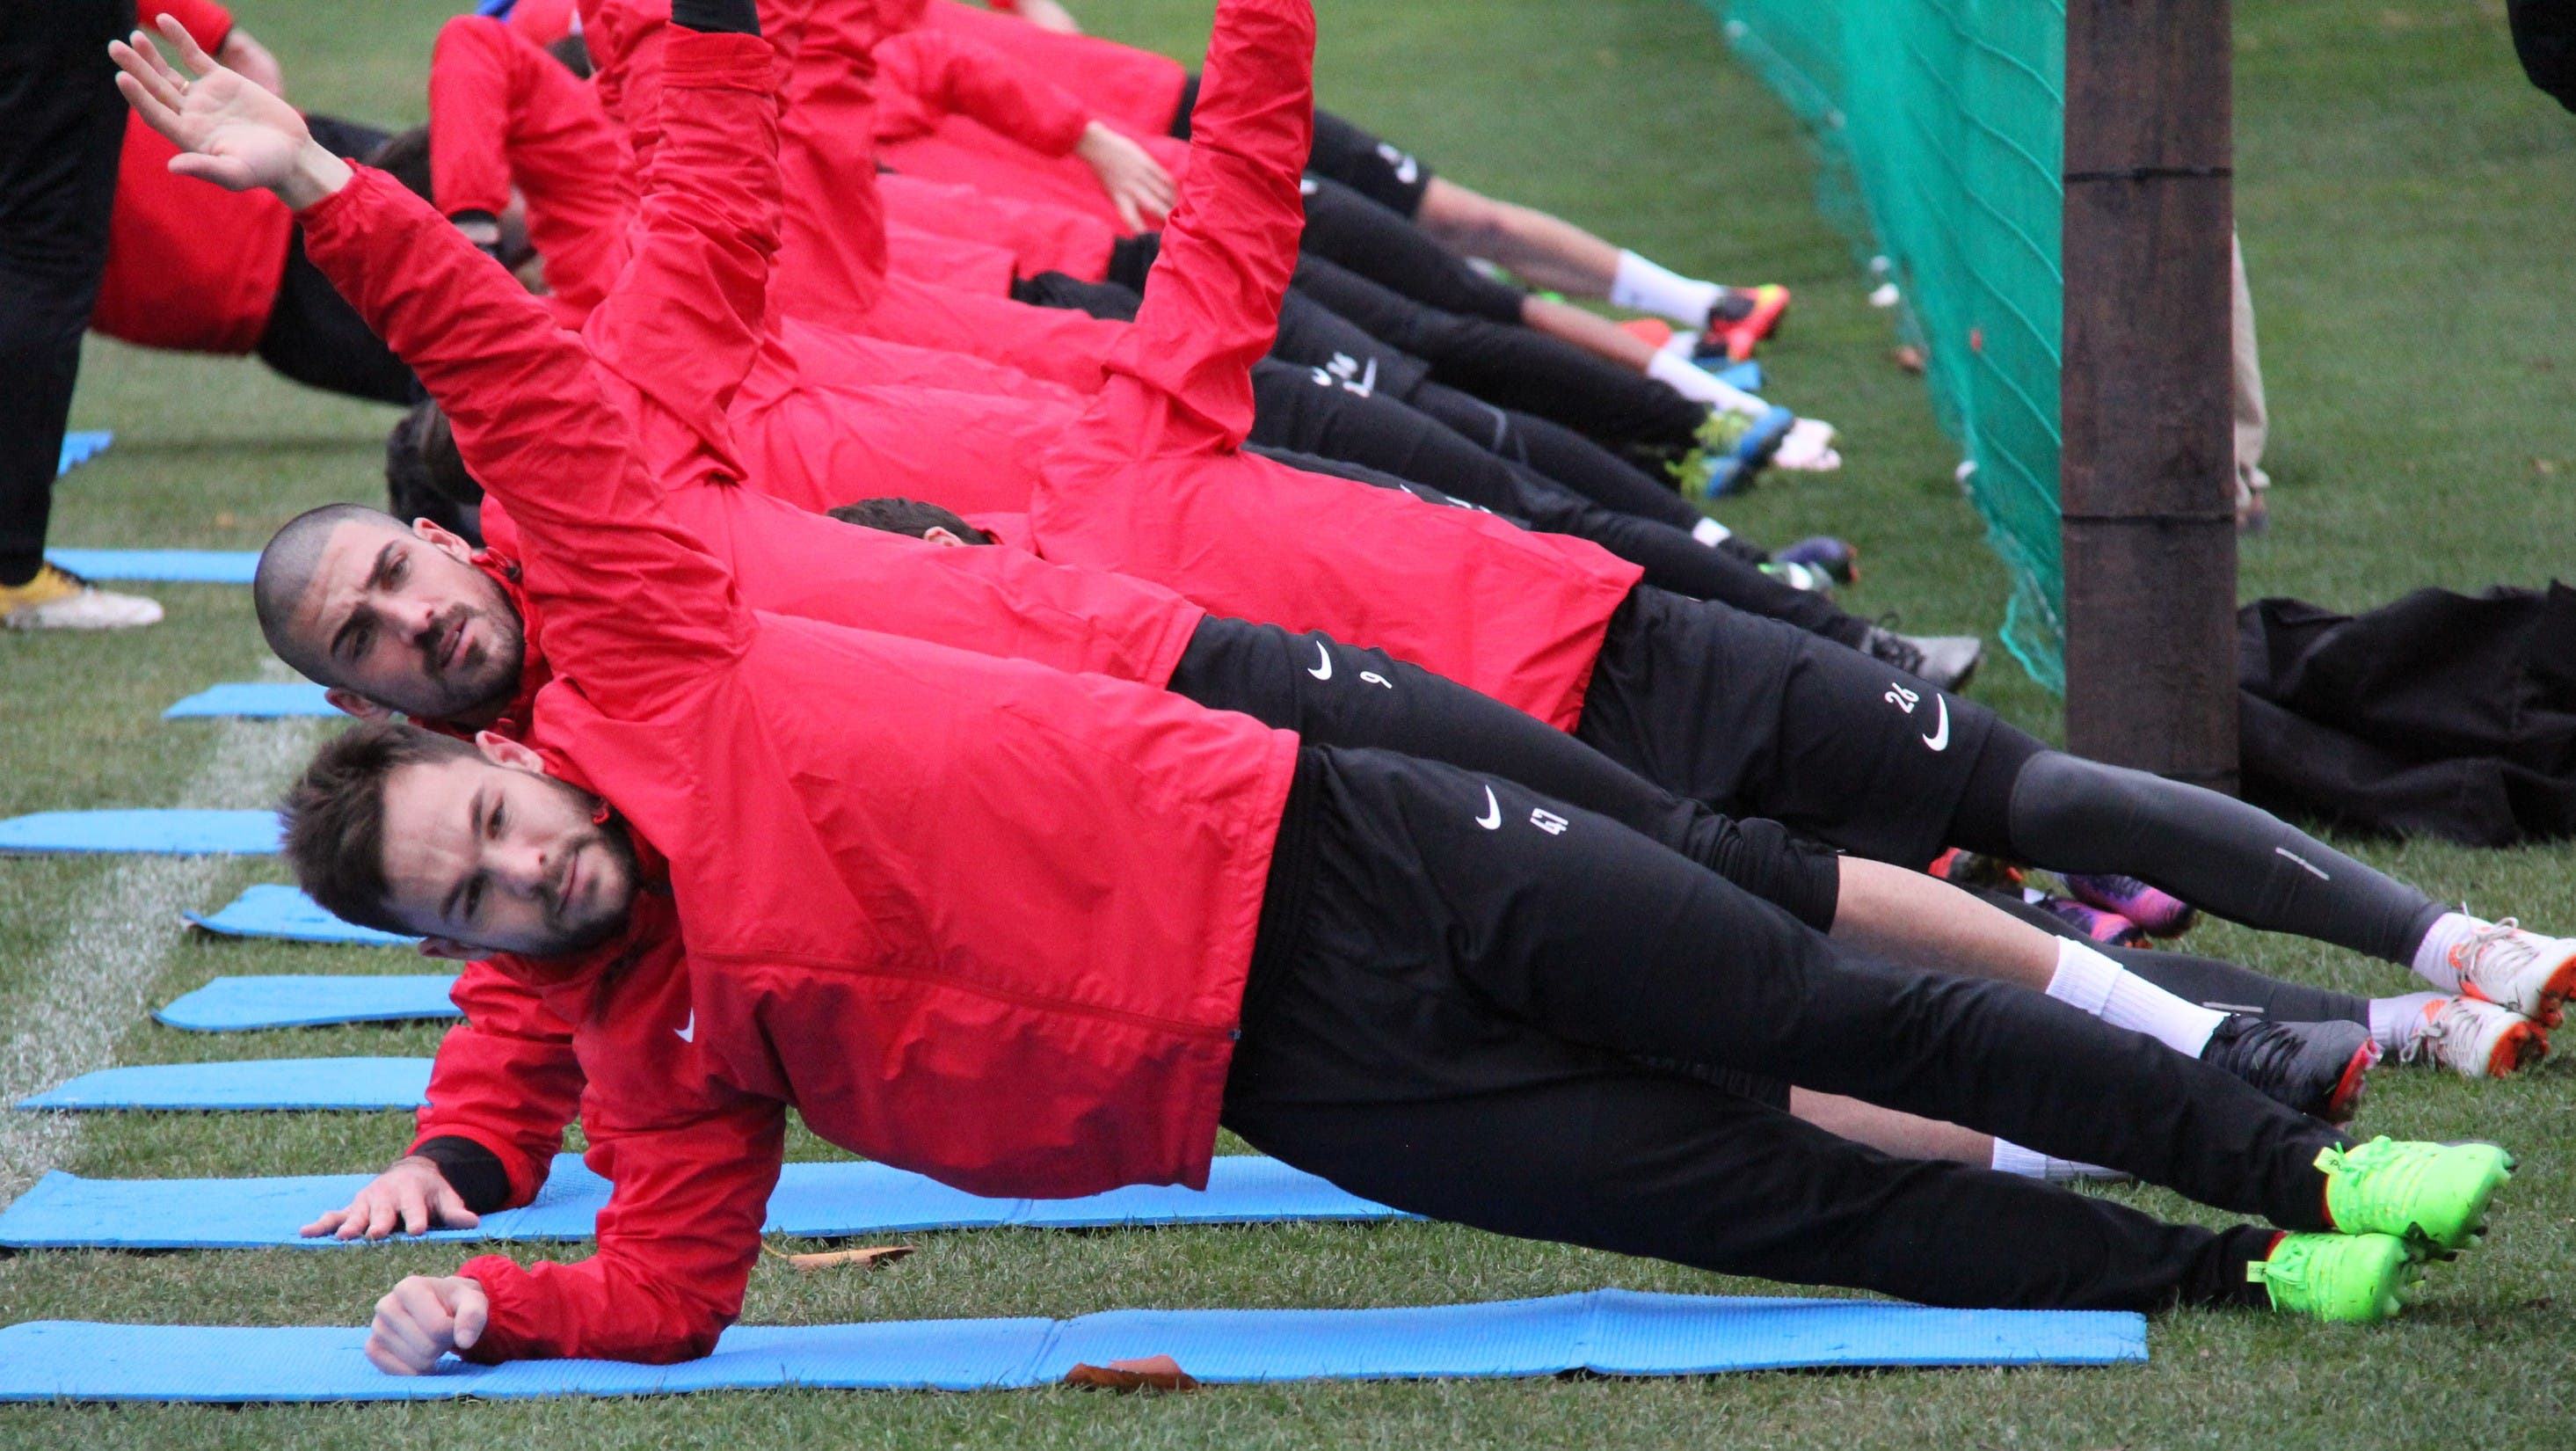 Wintertrainingslager des FC Aarau 2017 Patrick Rossini (vorne) und Alessandro Ciarrocchi während der Stabilisationsübungen